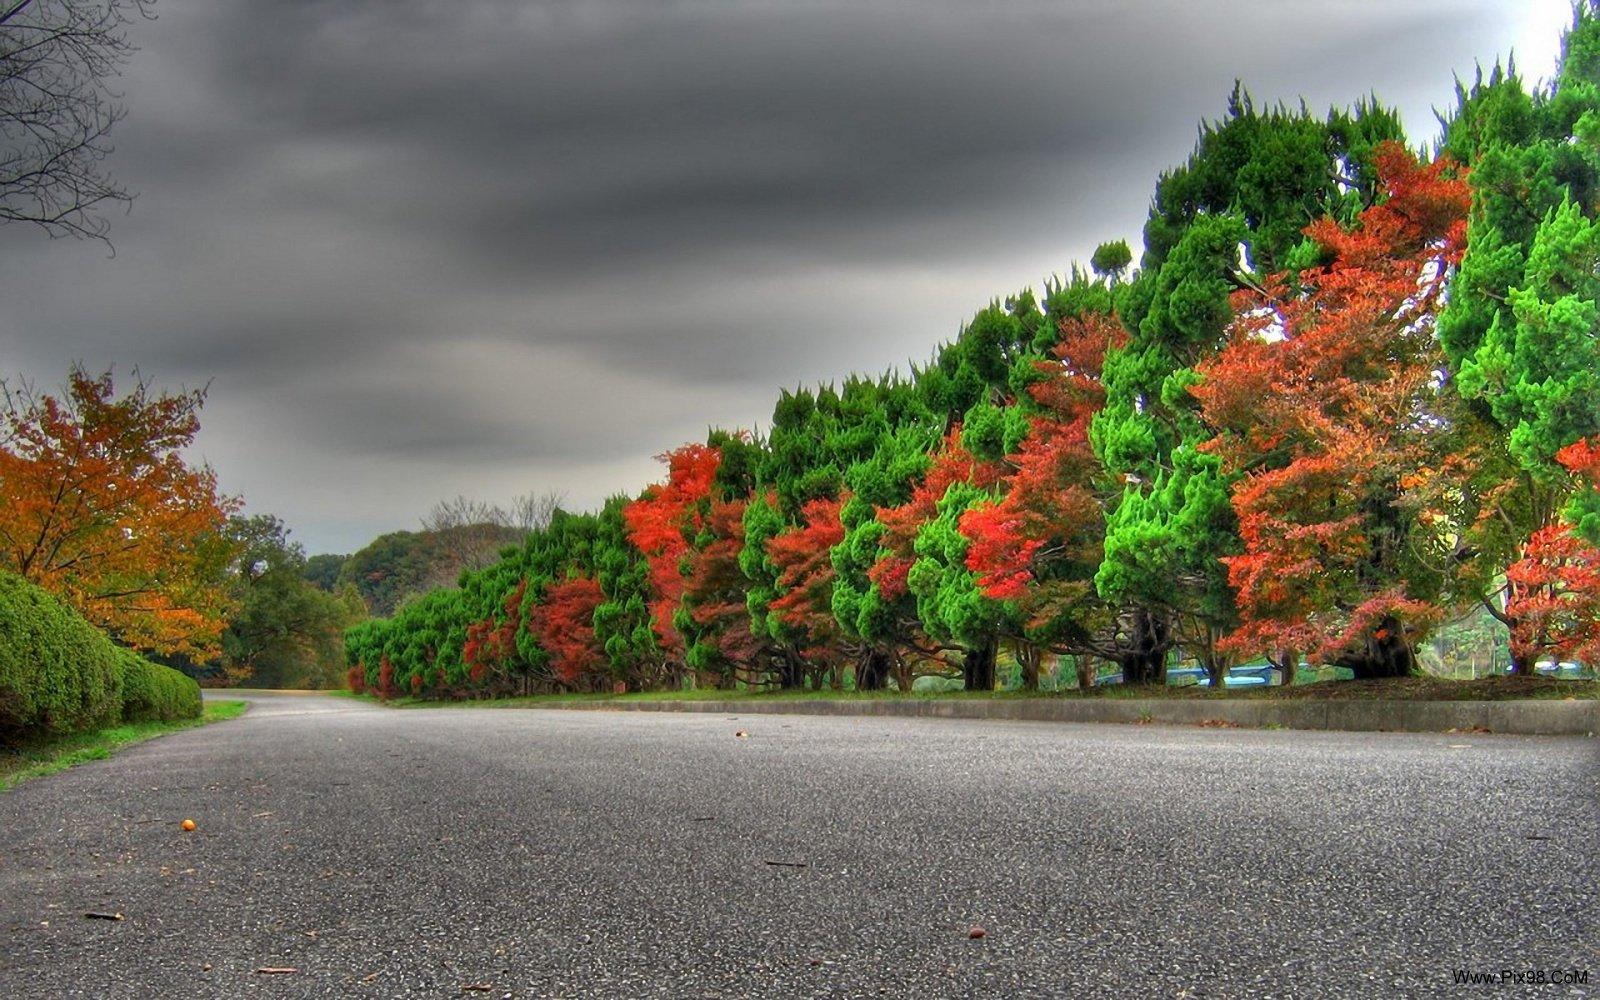 Amazing Nature  عکس طبیعت زیبا با کیفیت بالا